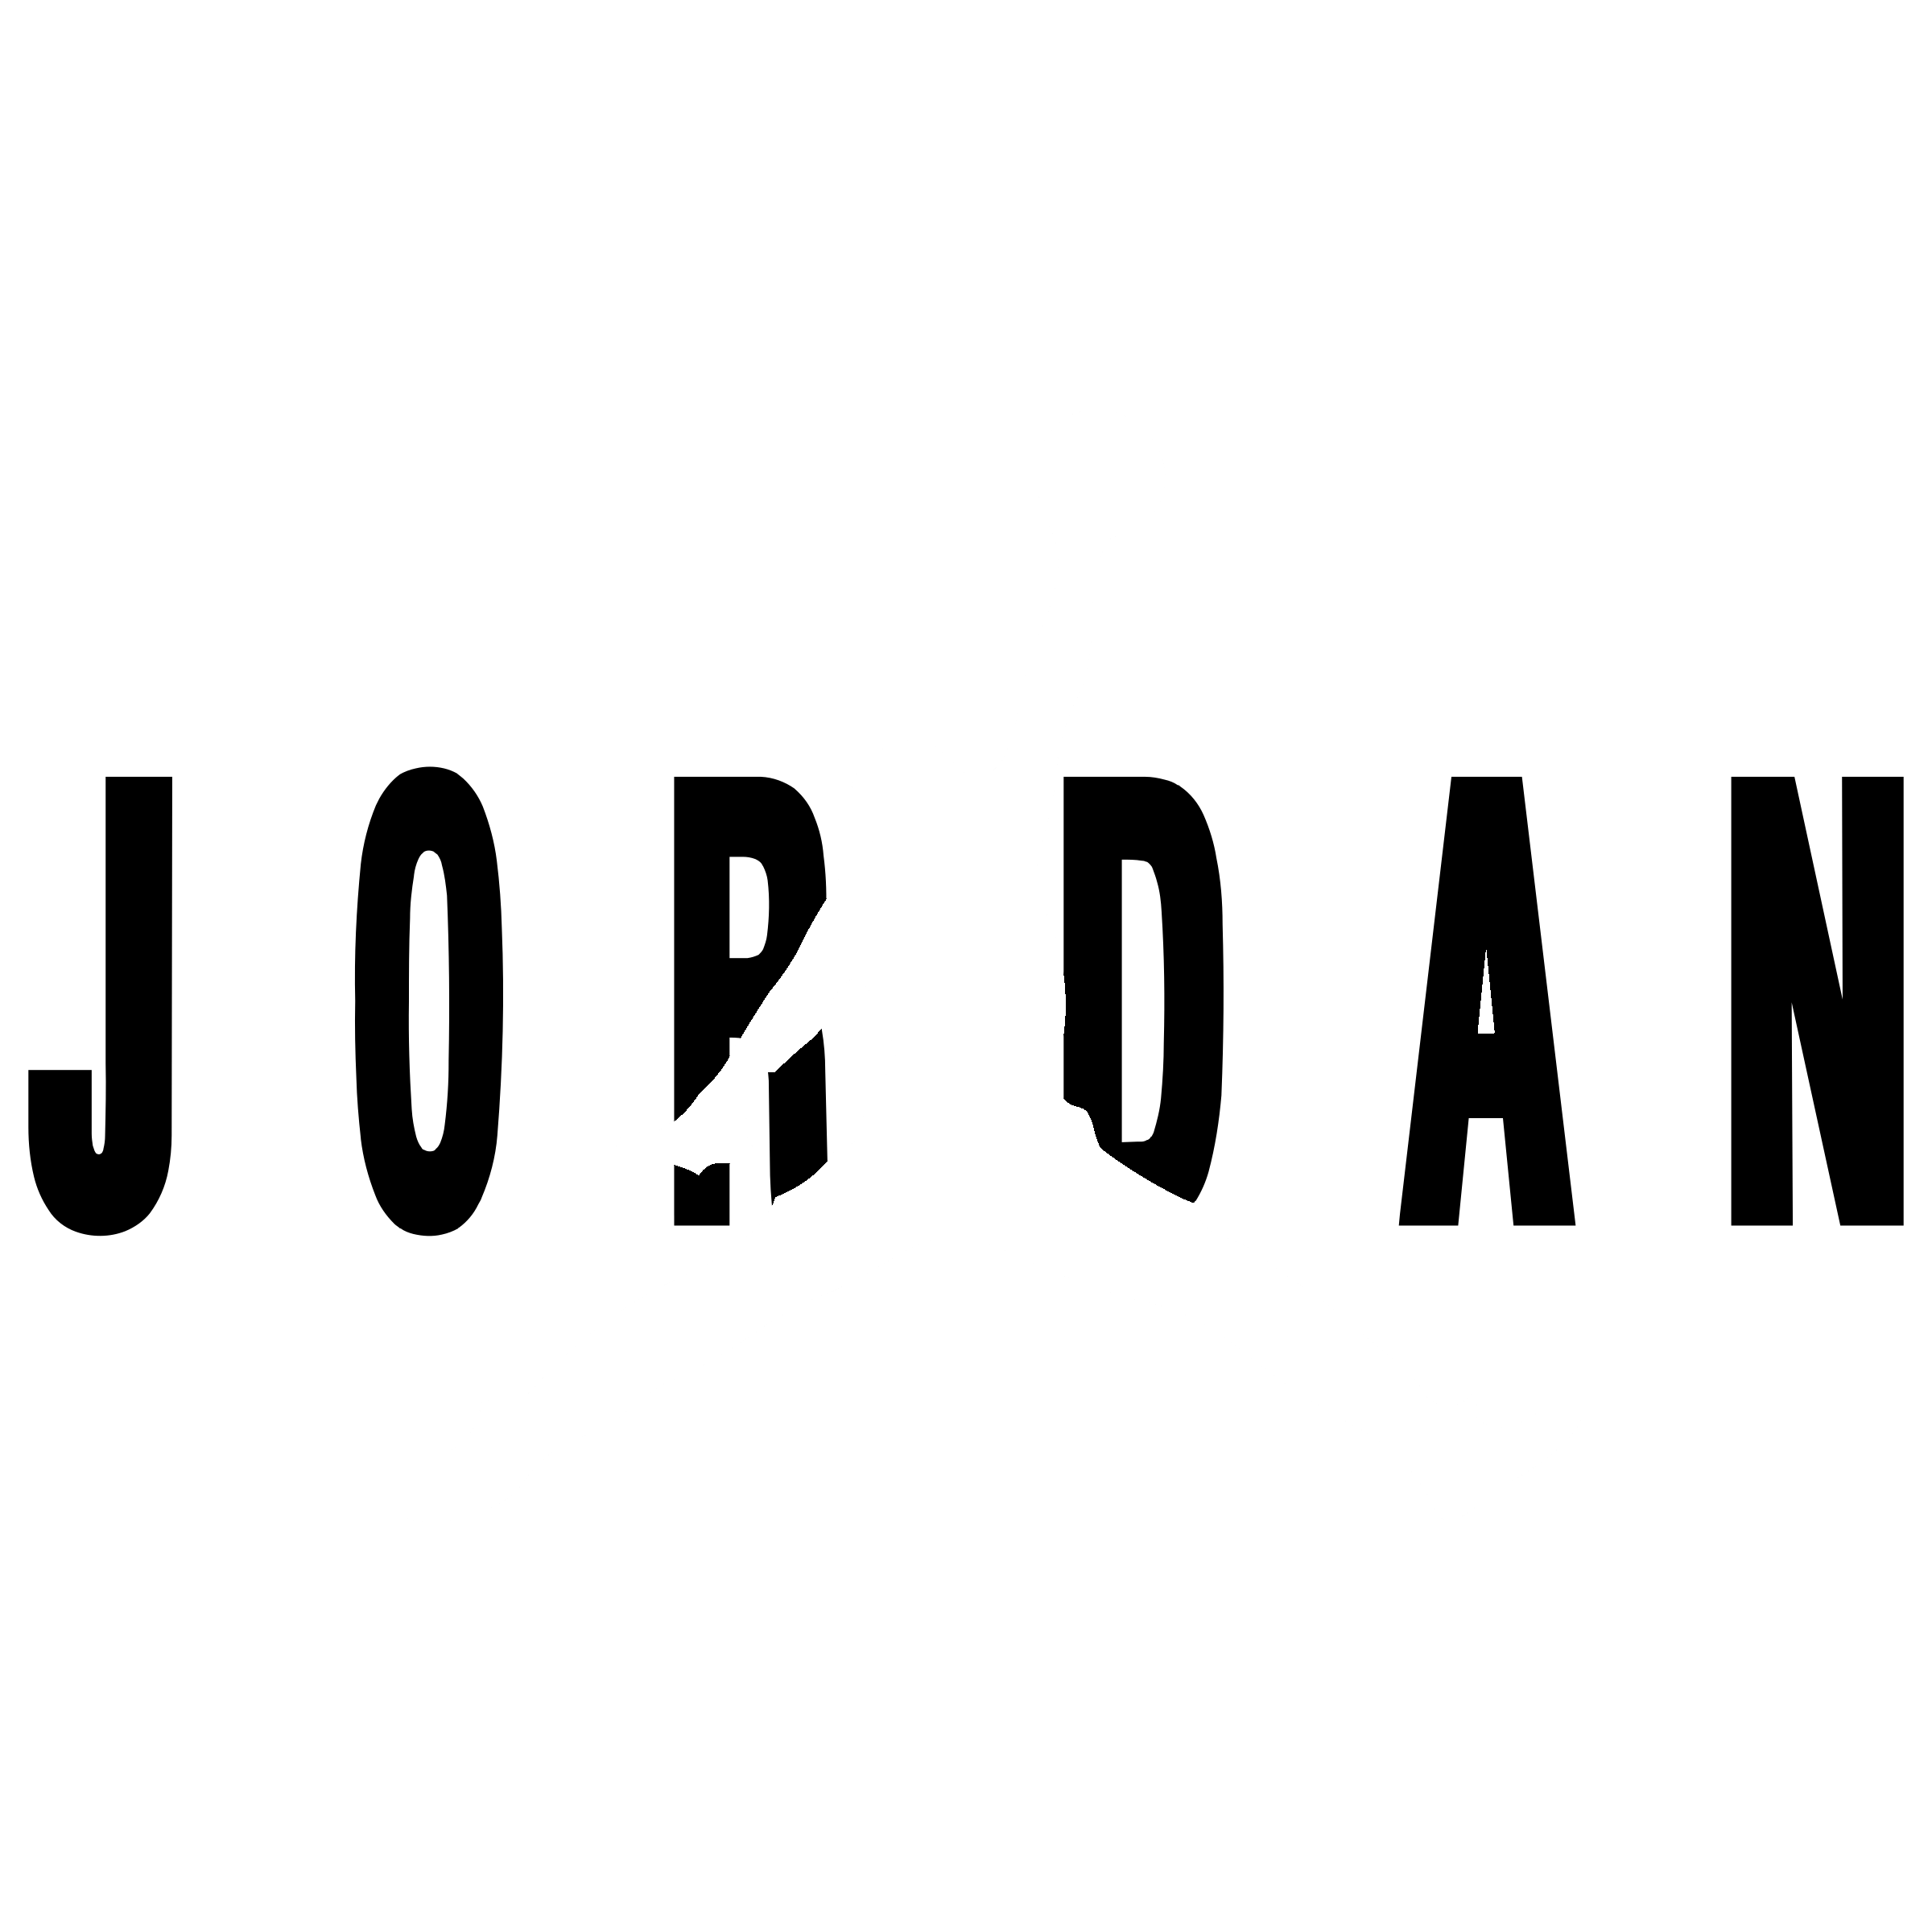 Jordan Air Logo Black And White